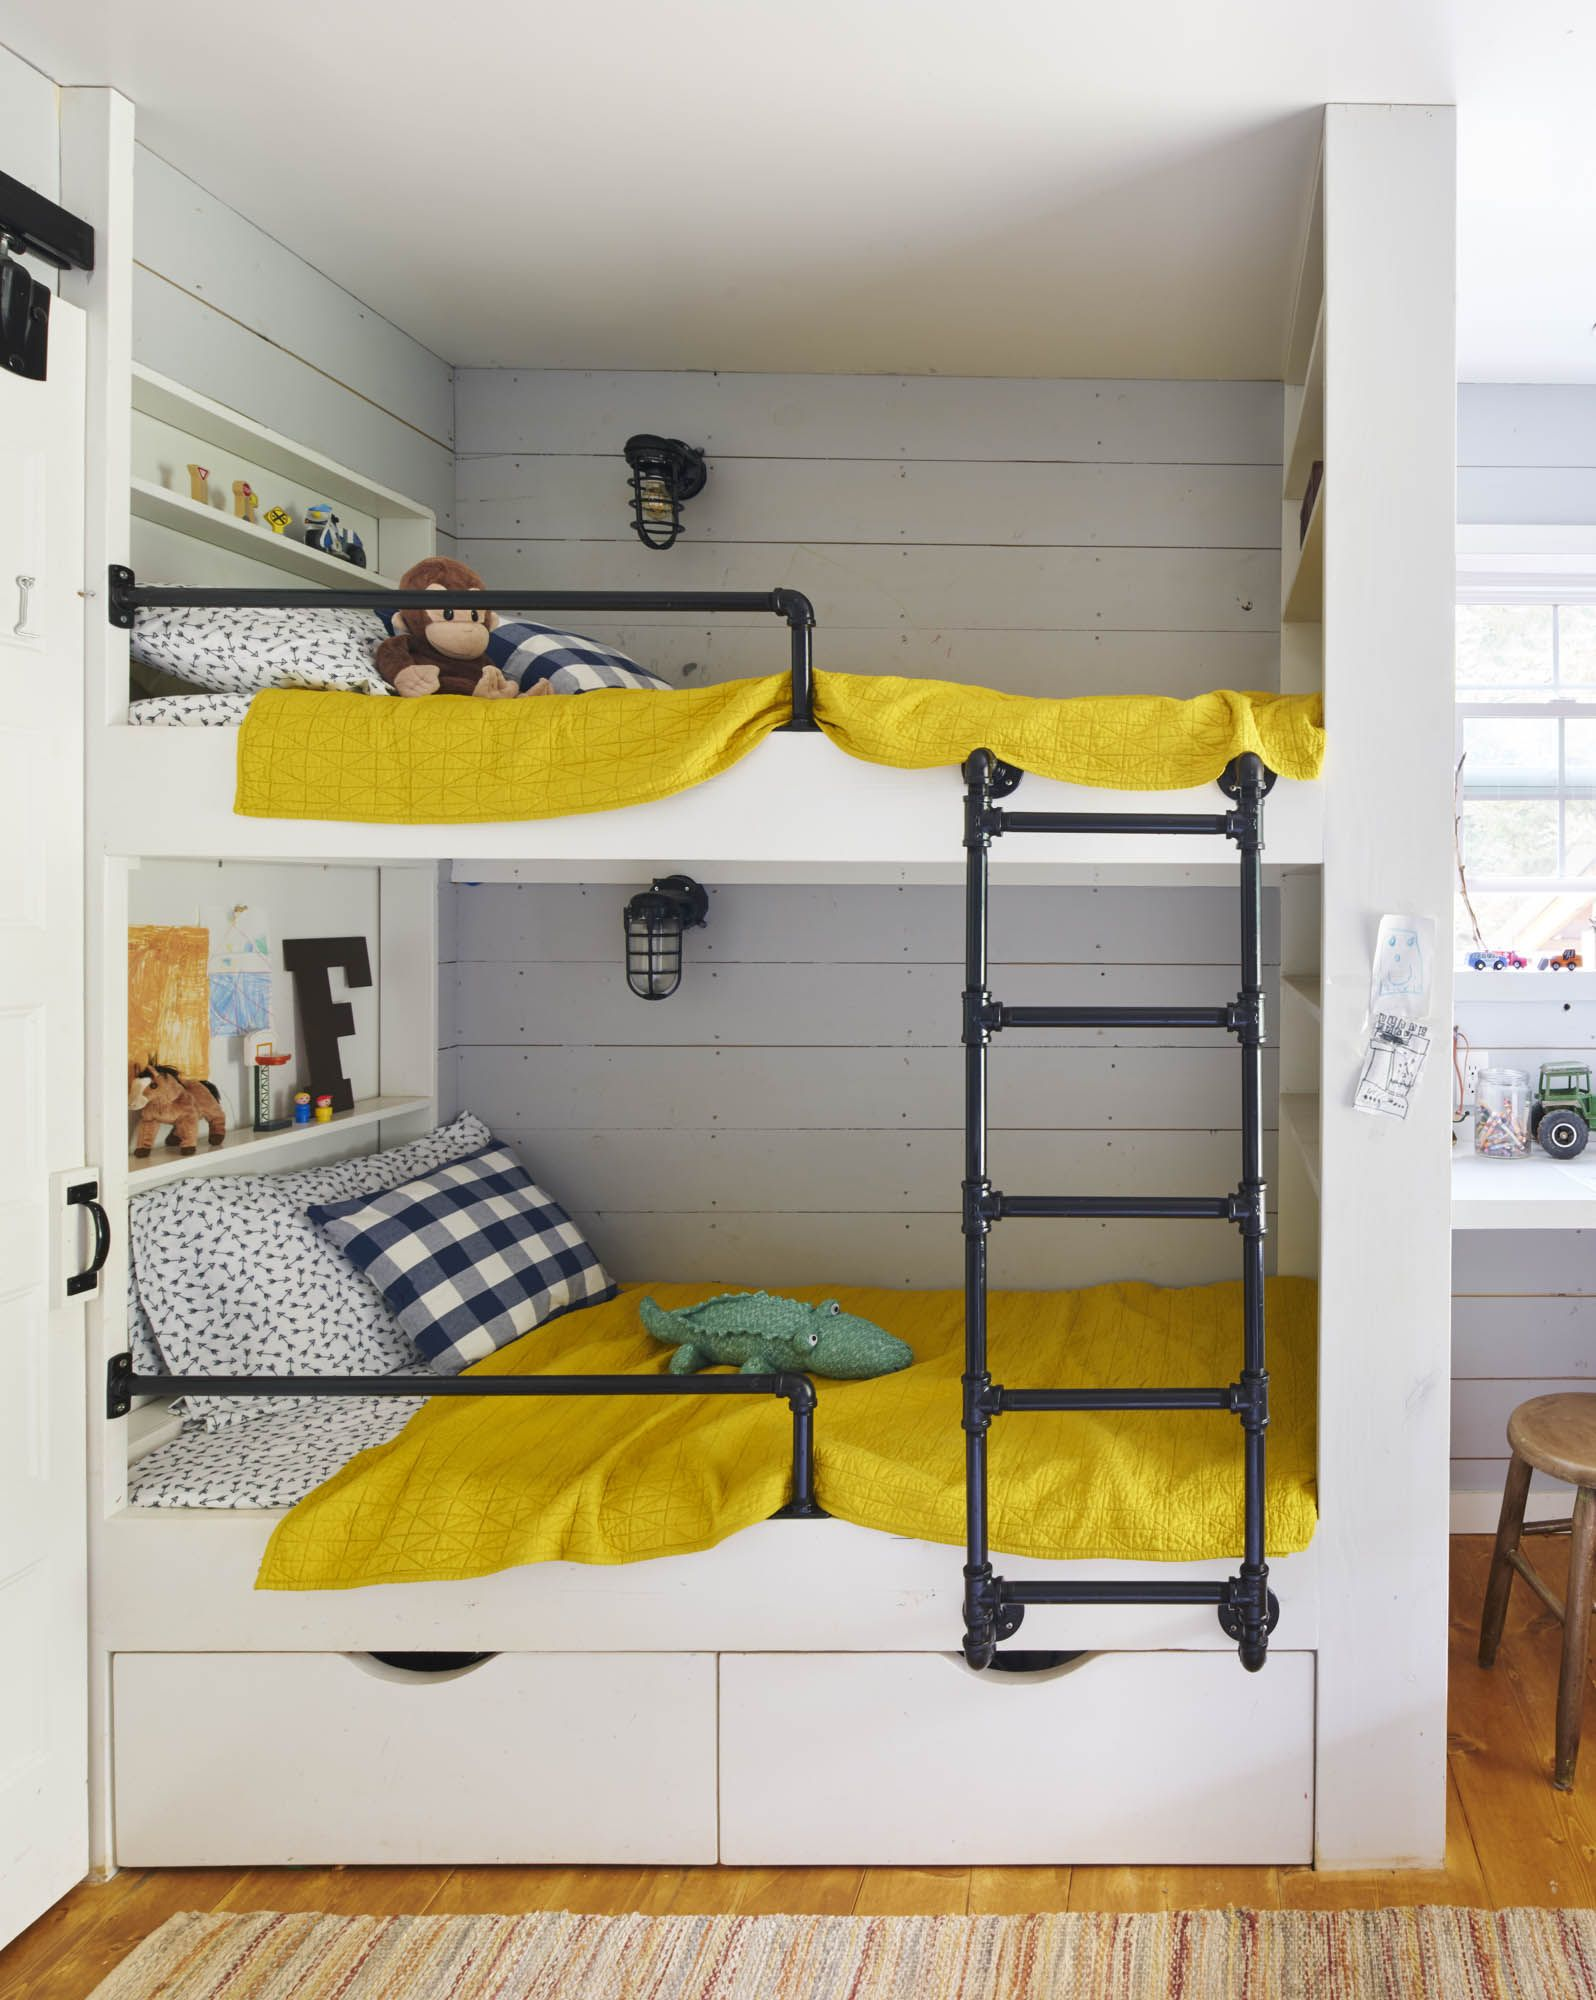 1631 Ctl Mccullock 598 Jpg Bunk Beds Built In Bunk Beds Bunk